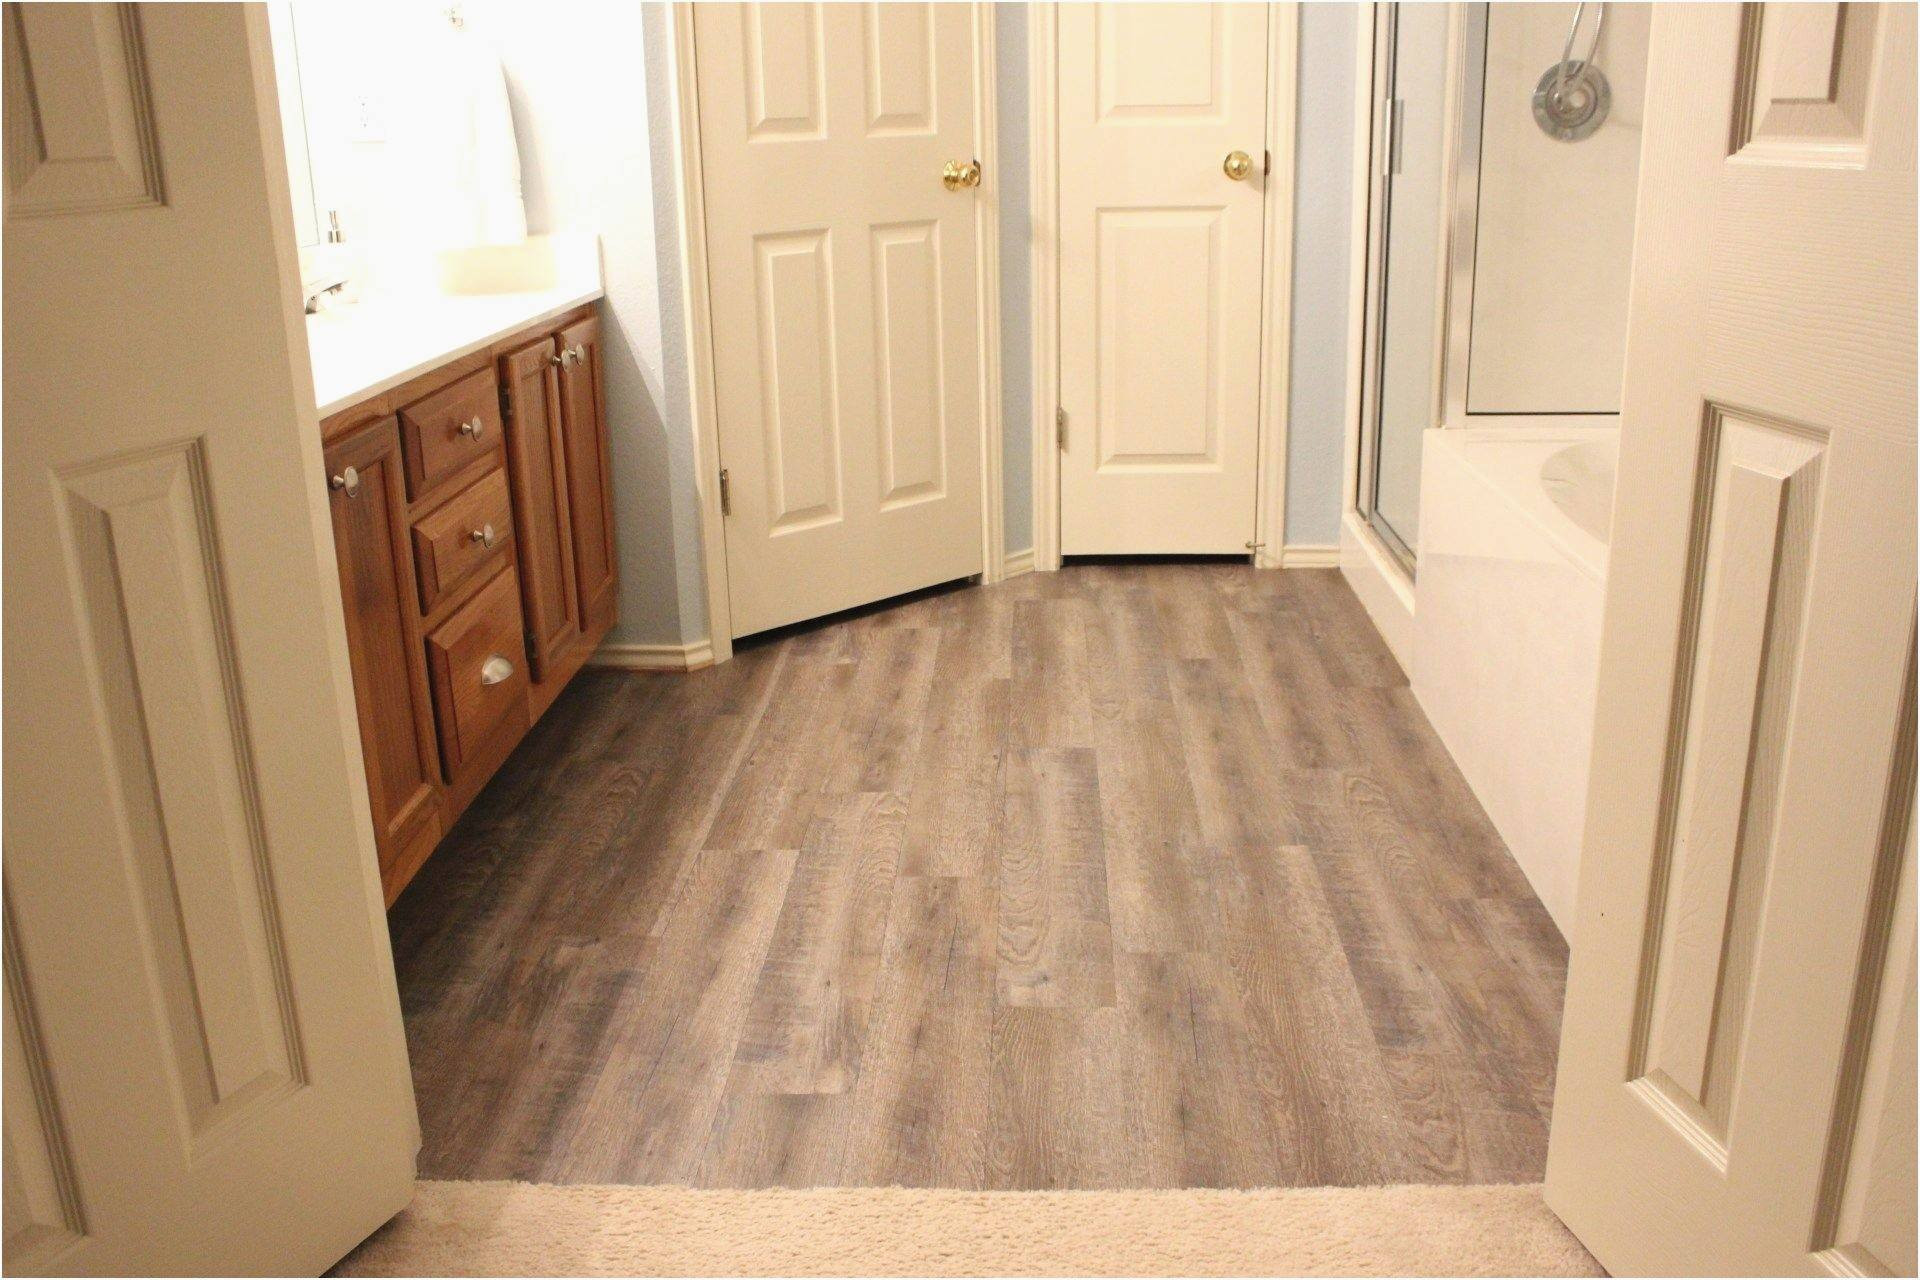 Hardwood Flooring Depot Of Find the Best Home Depot Sale On Flooring Tips Best Flooring Ideas Regarding Flooring Sales Near Me Vinyl Plan Flooring Elegant Flooring Sale Near Me Stock 0d Grace